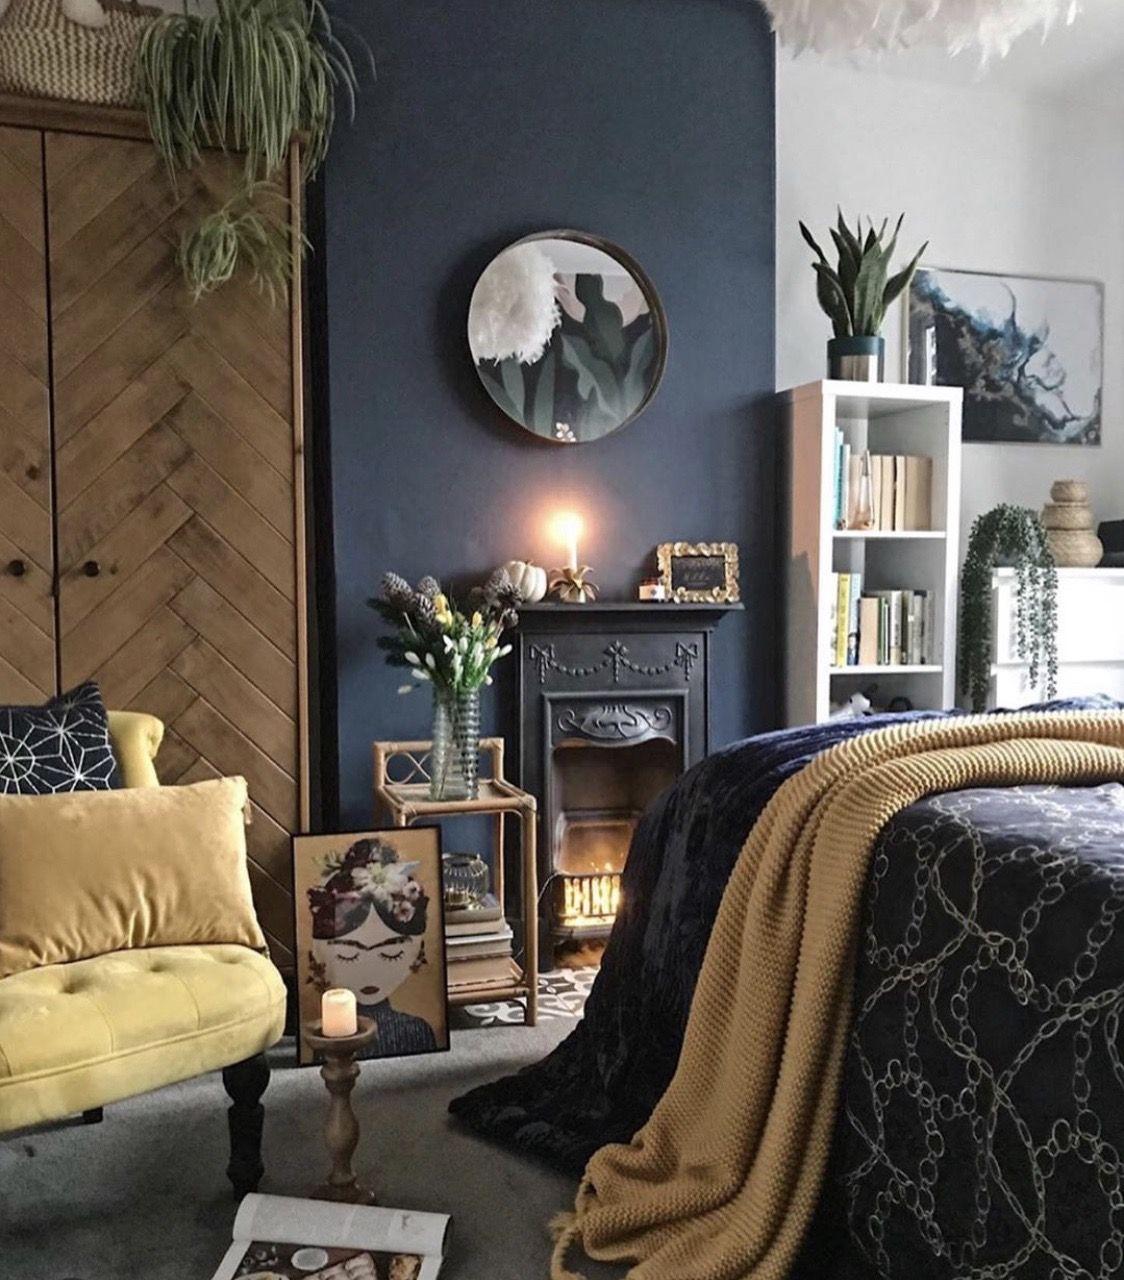 Pin by Minna Arola on Home (Int) in 2020 | Dark blue ...